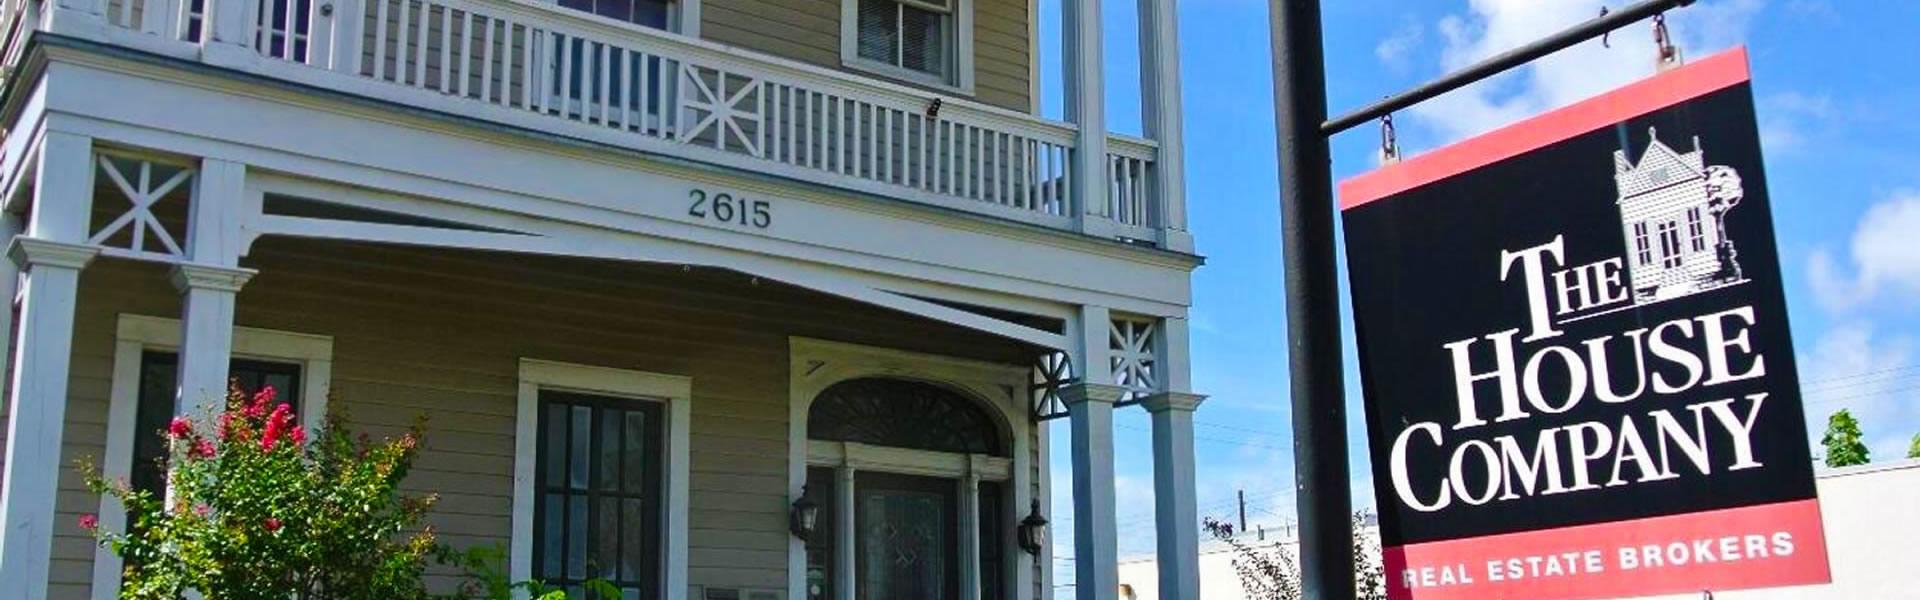 The House Company, Galveston TX